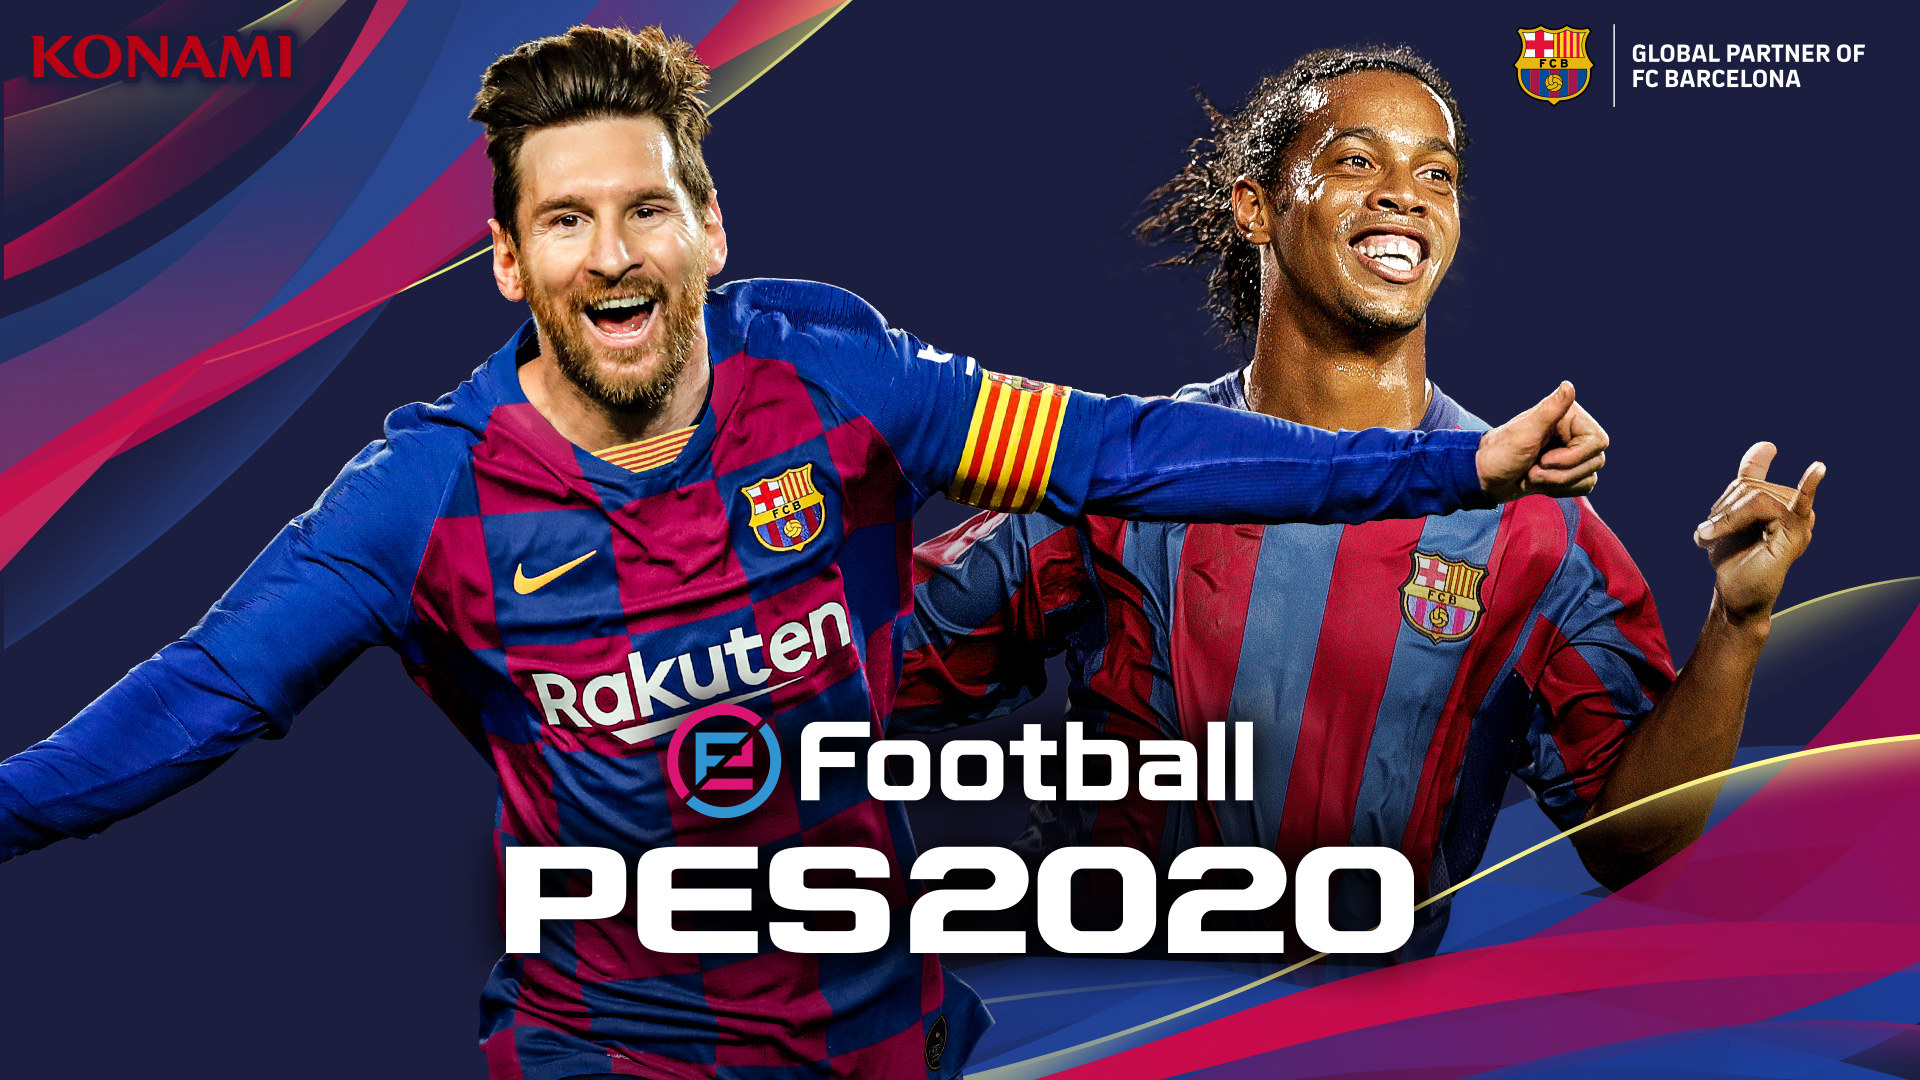 Konami svela eFootball PES 2020: immagini, video e dettagli dall'E3 2019